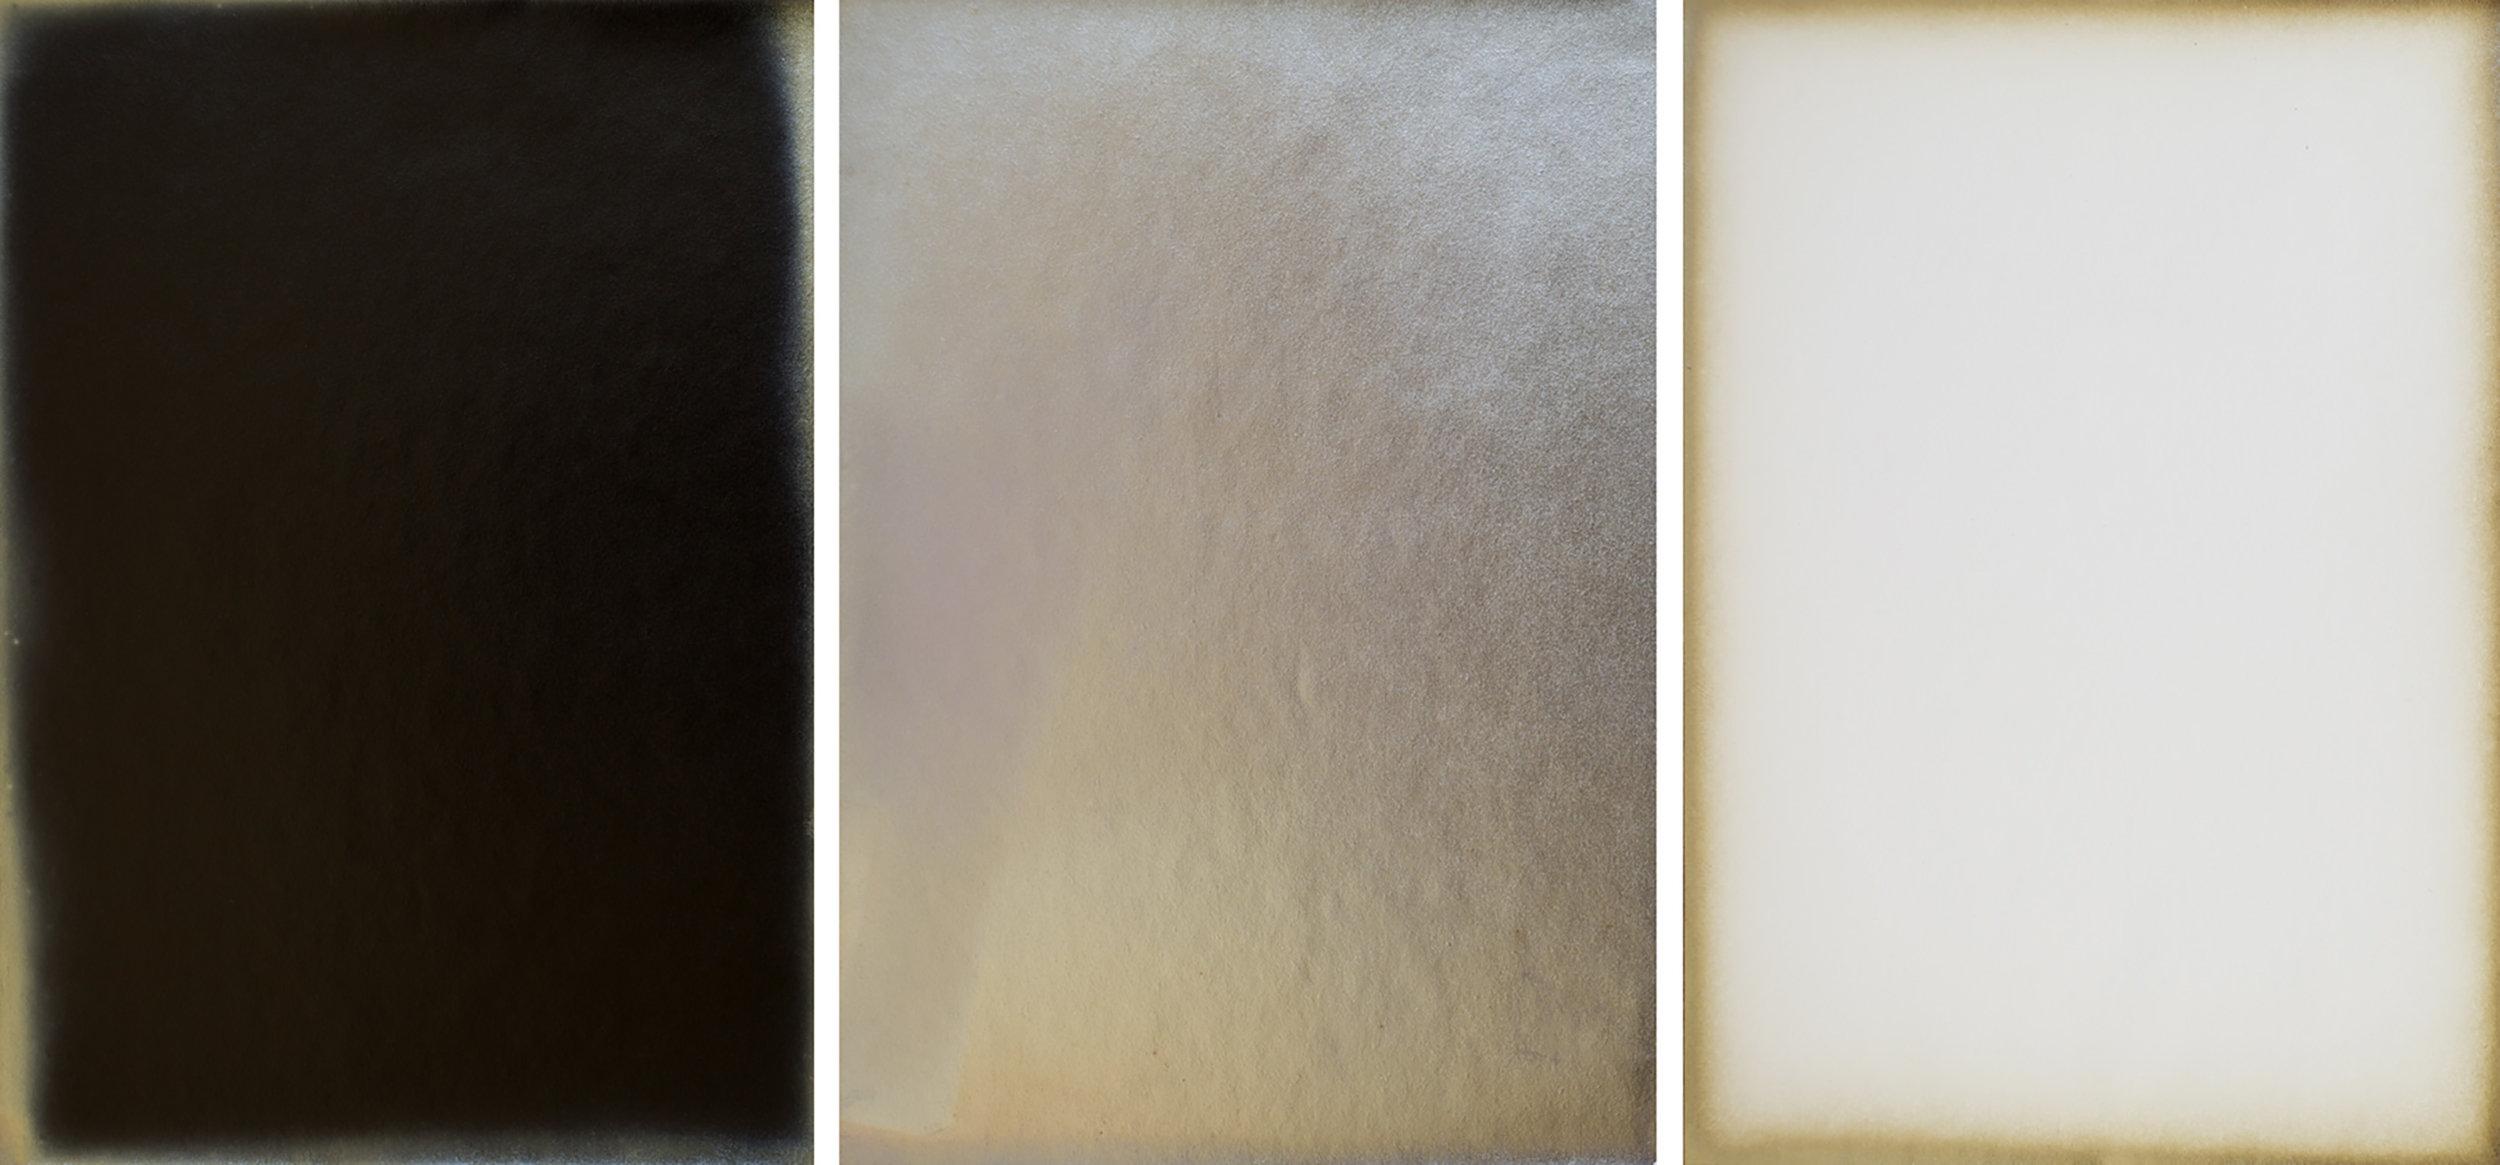 Alison Rossiter, Eastman Kodak Velox, exact expiration date unknown, ca. 1910s, processed 2017